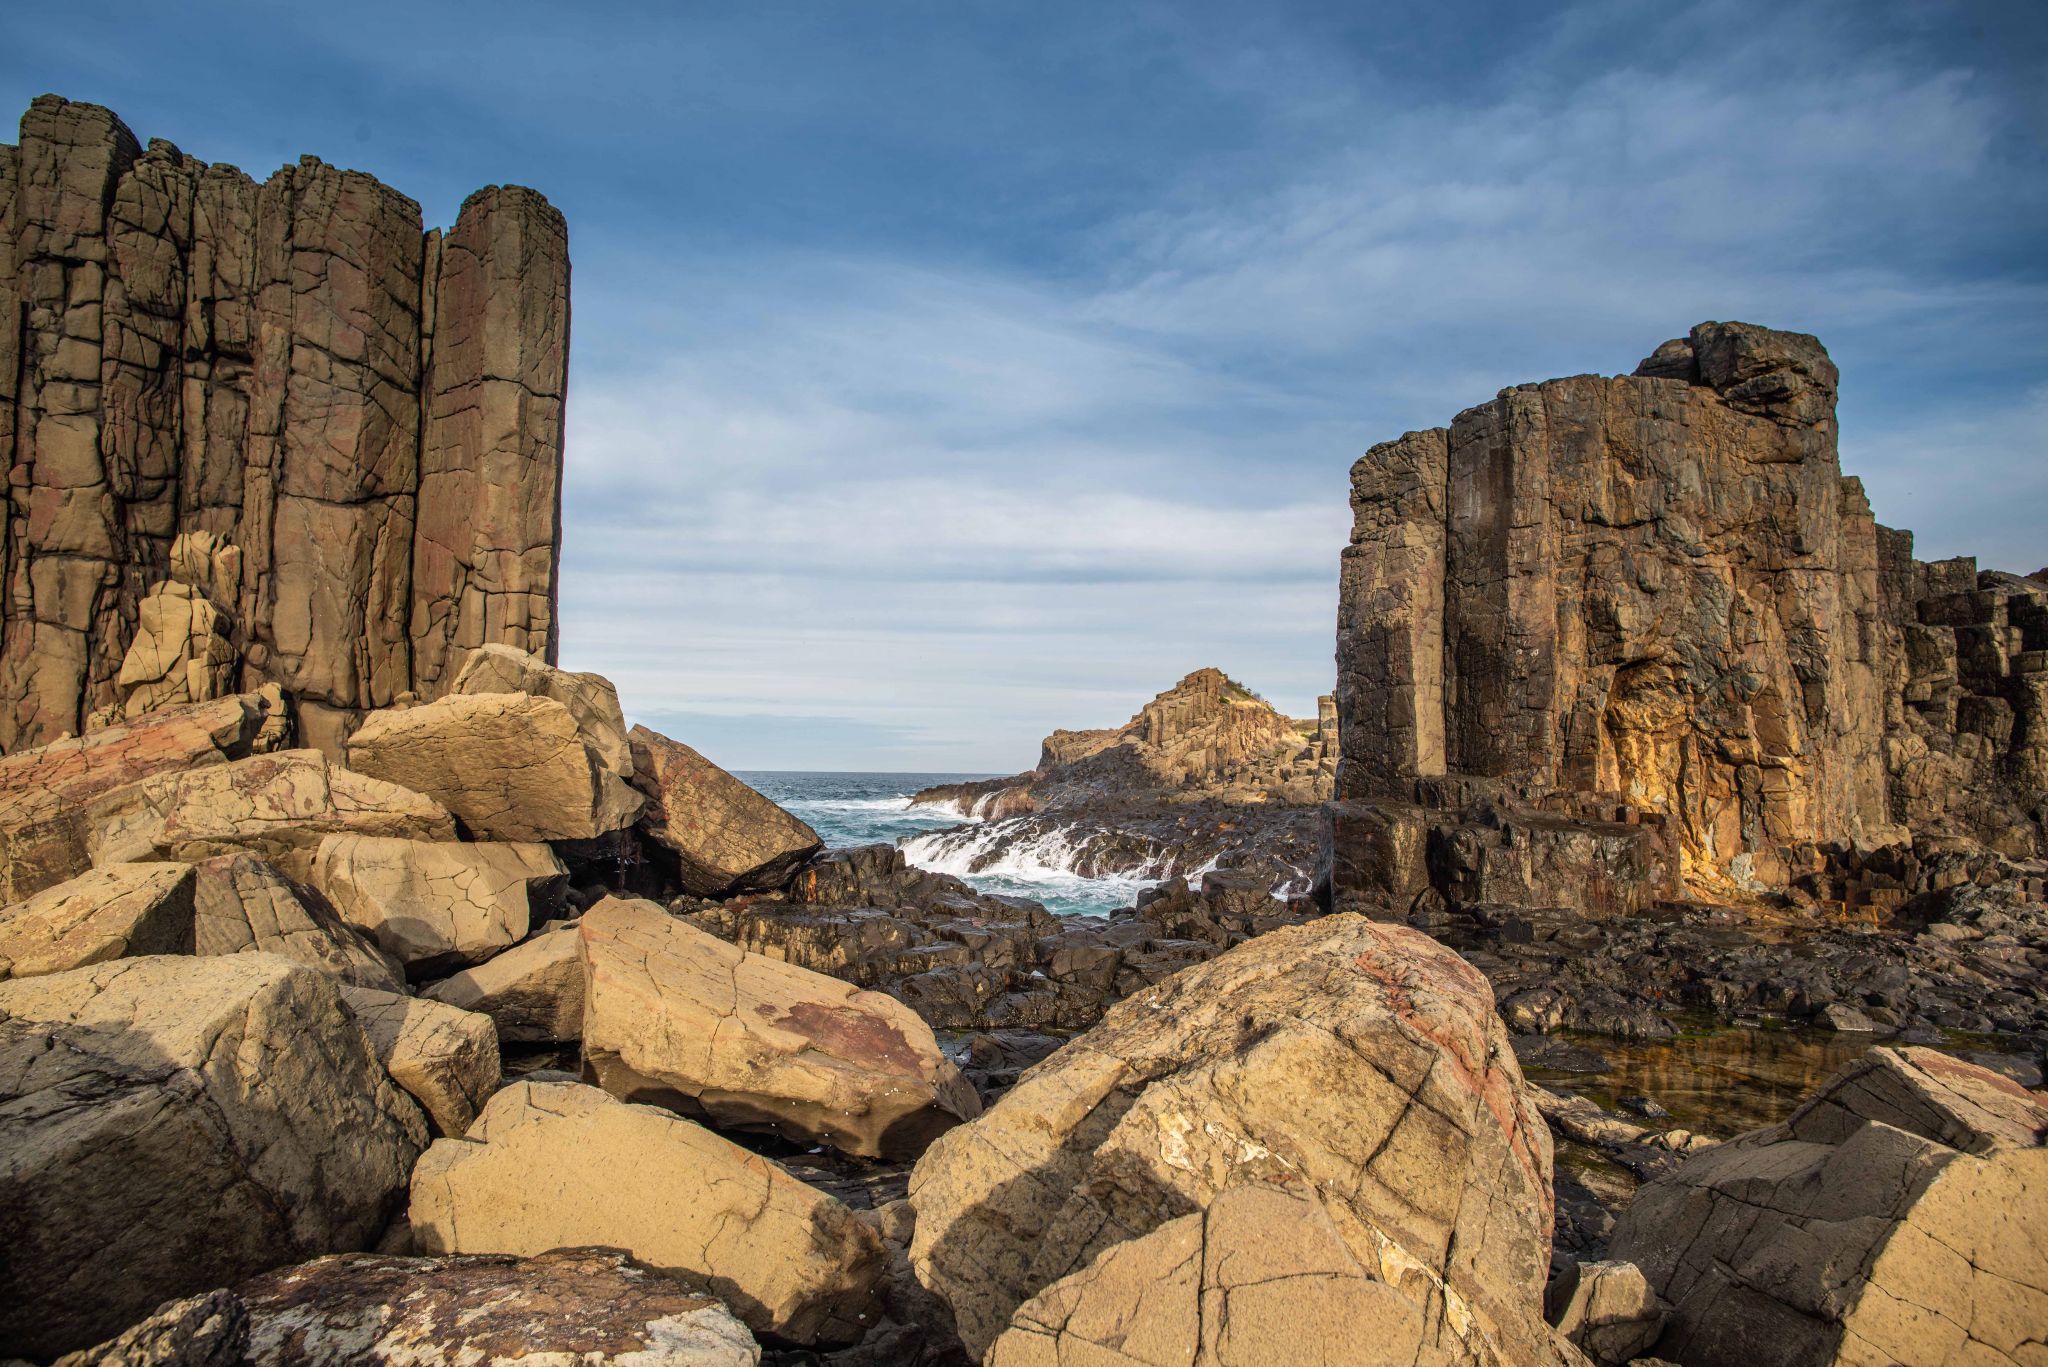 Bombo Headland Quarry, Australia